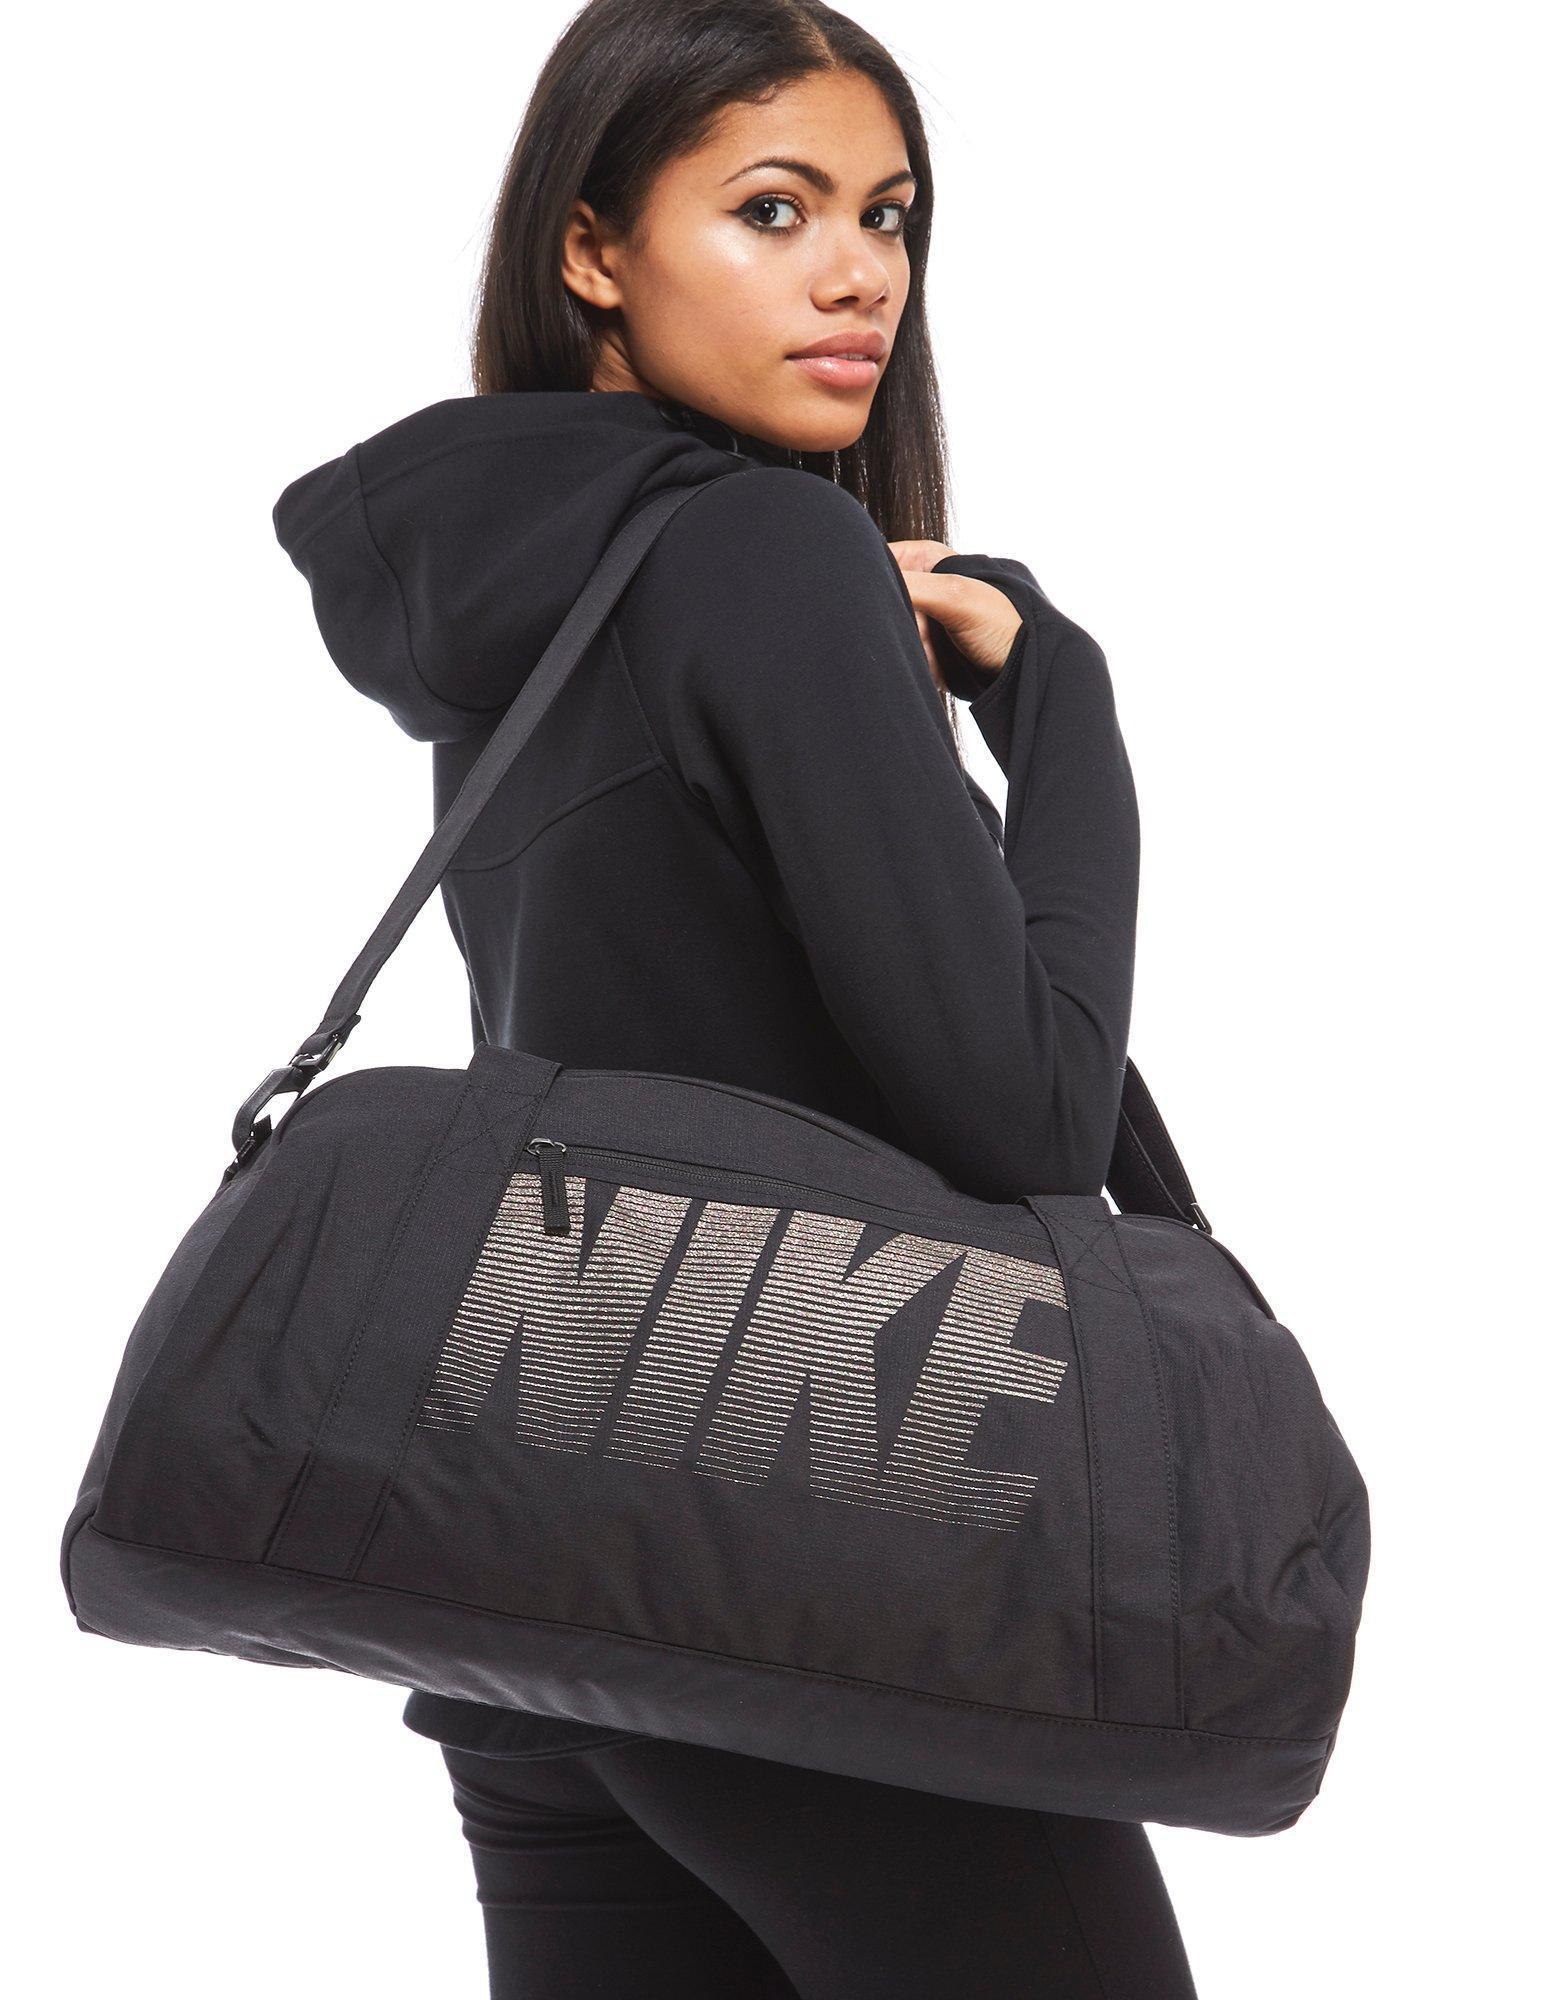 Lyst - Nike Gym Club Training Duffle Bag in Black for Men f23261d2d2e3